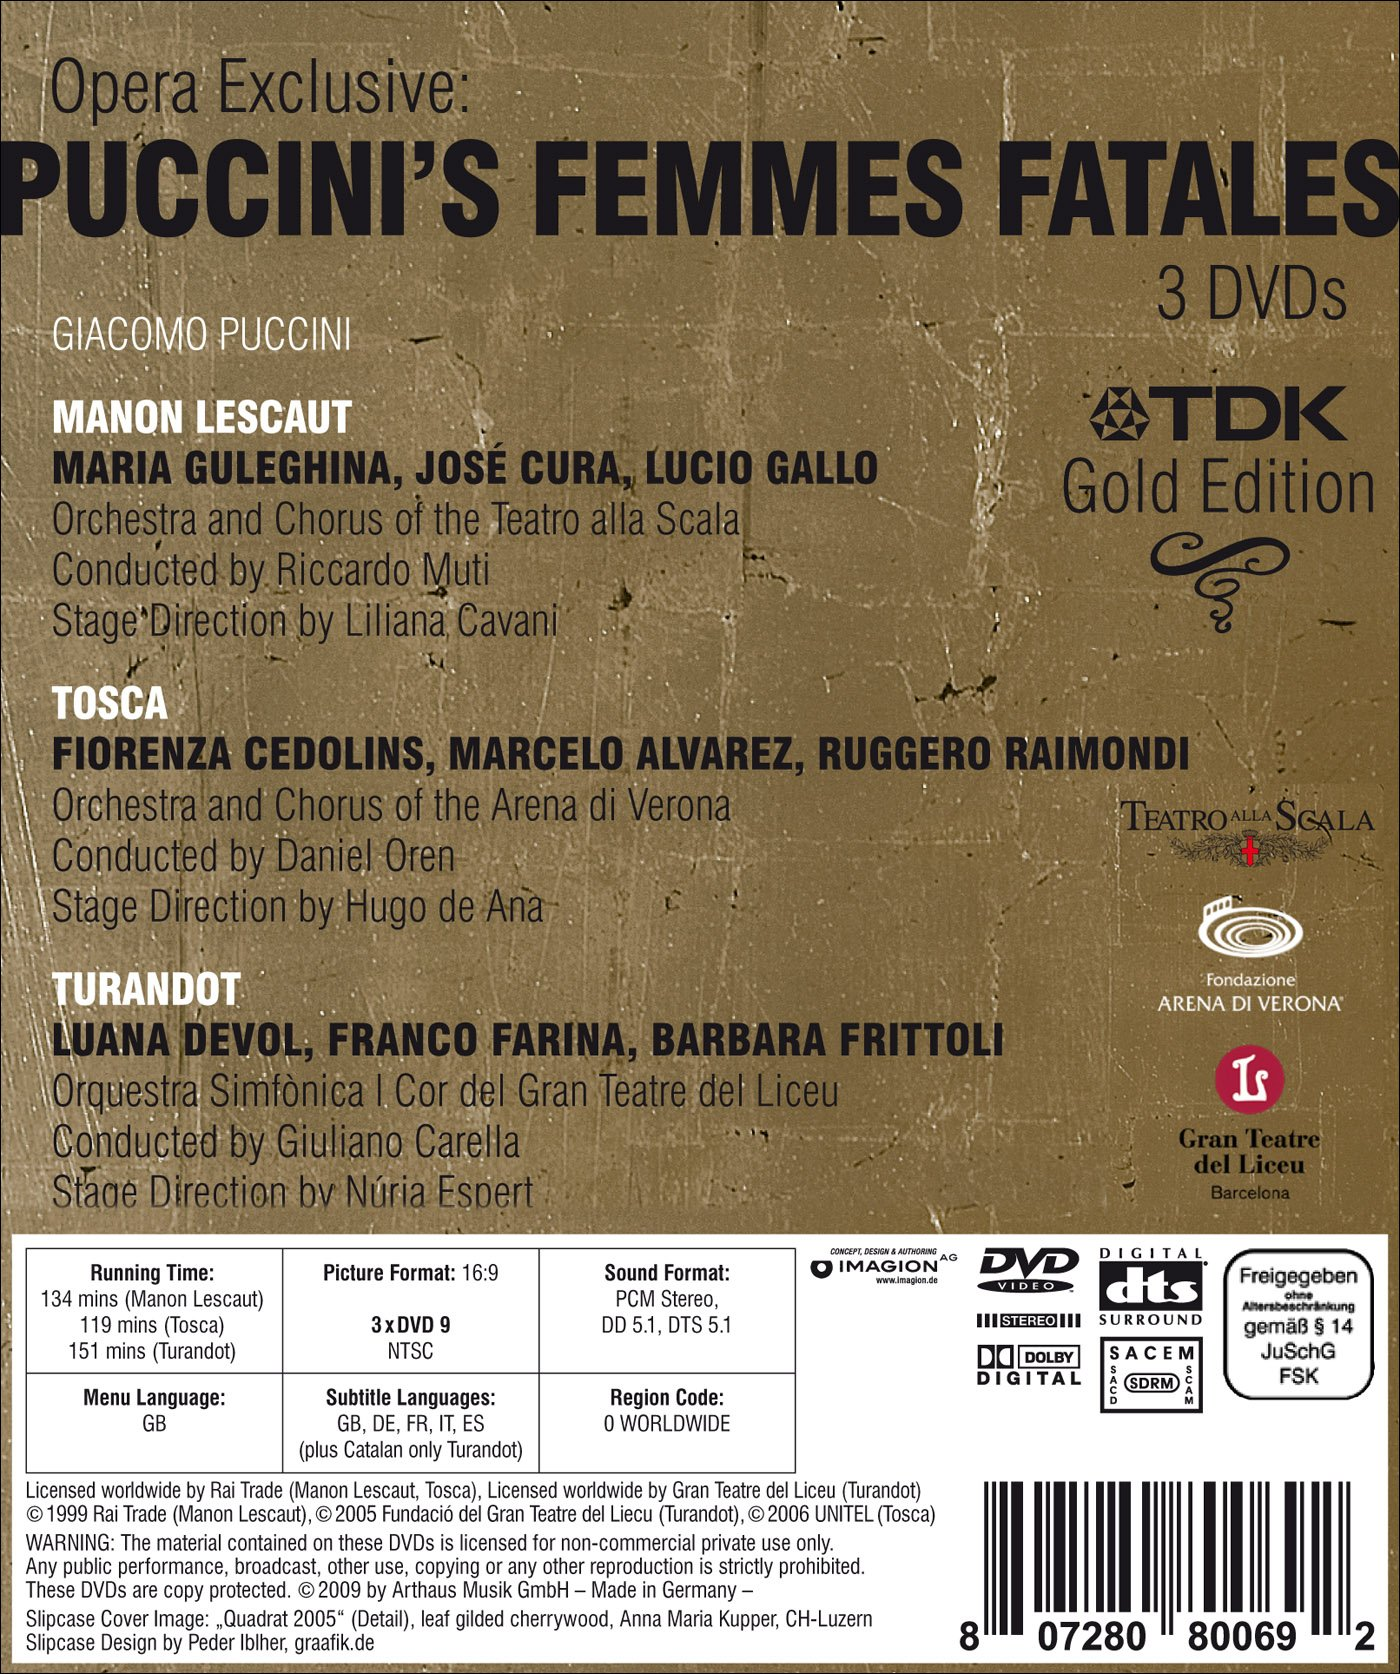 Opera Exclusive: Puccini's Femmes Fatales - Manon Lescaut/Tosca/Turandot